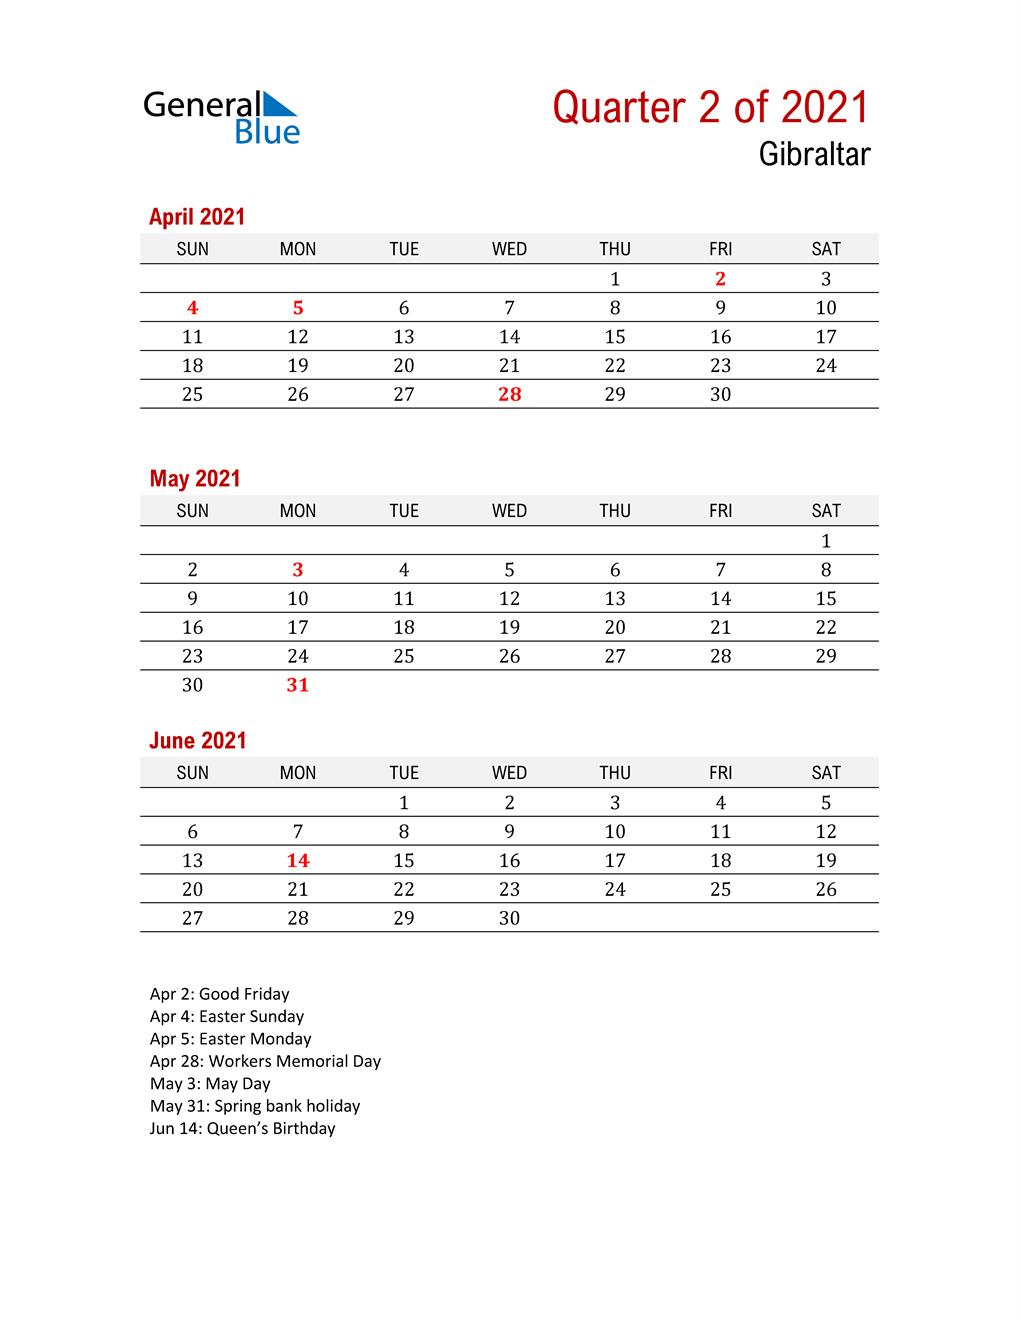 Printable Three Month Calendar for Gibraltar